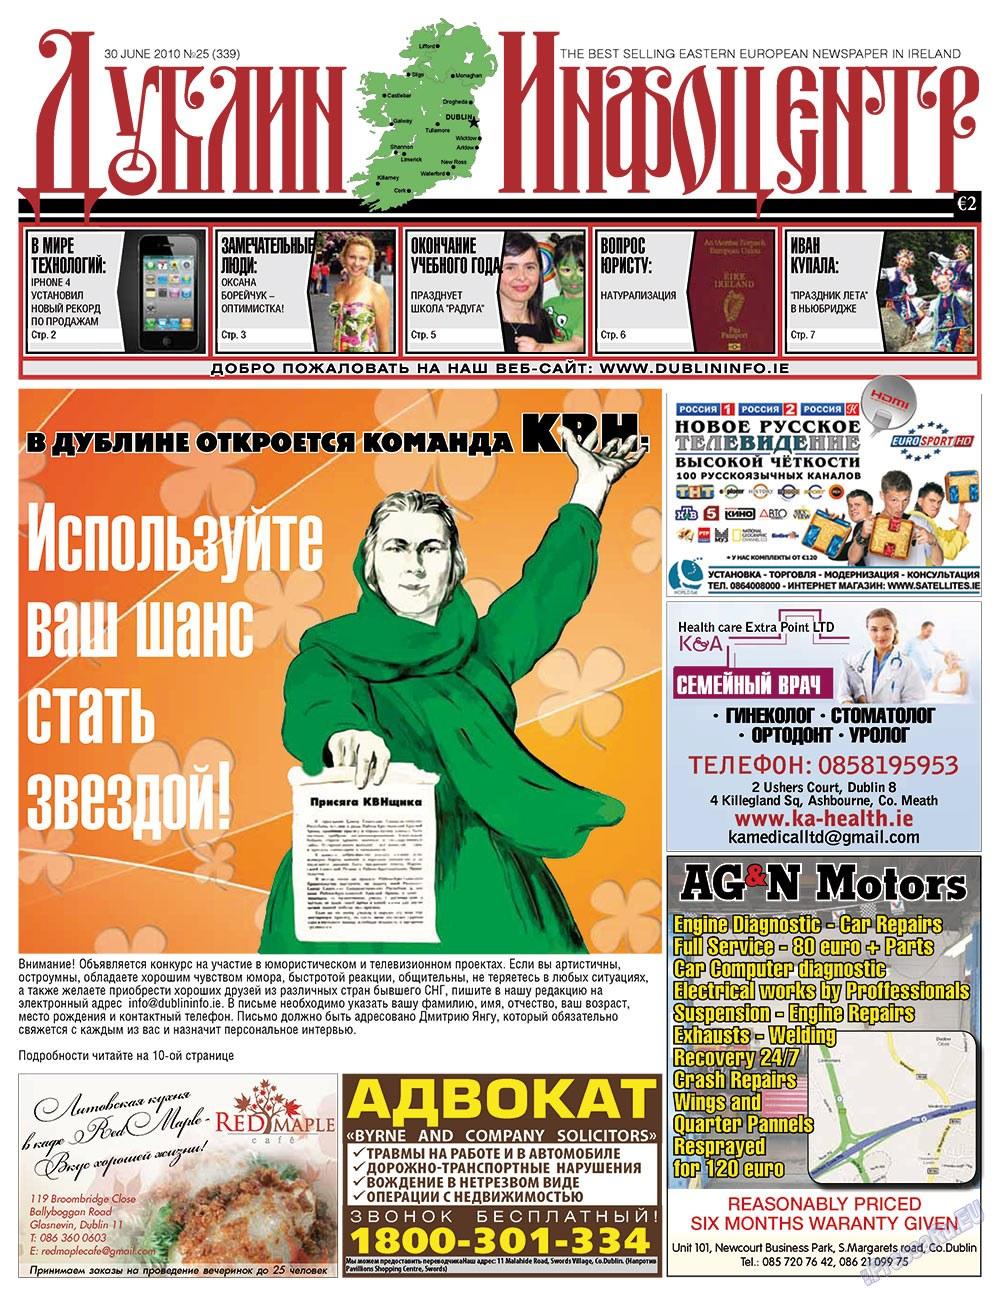 Дублин инфоцентр (газета). 2010 год, номер 25, стр. 1